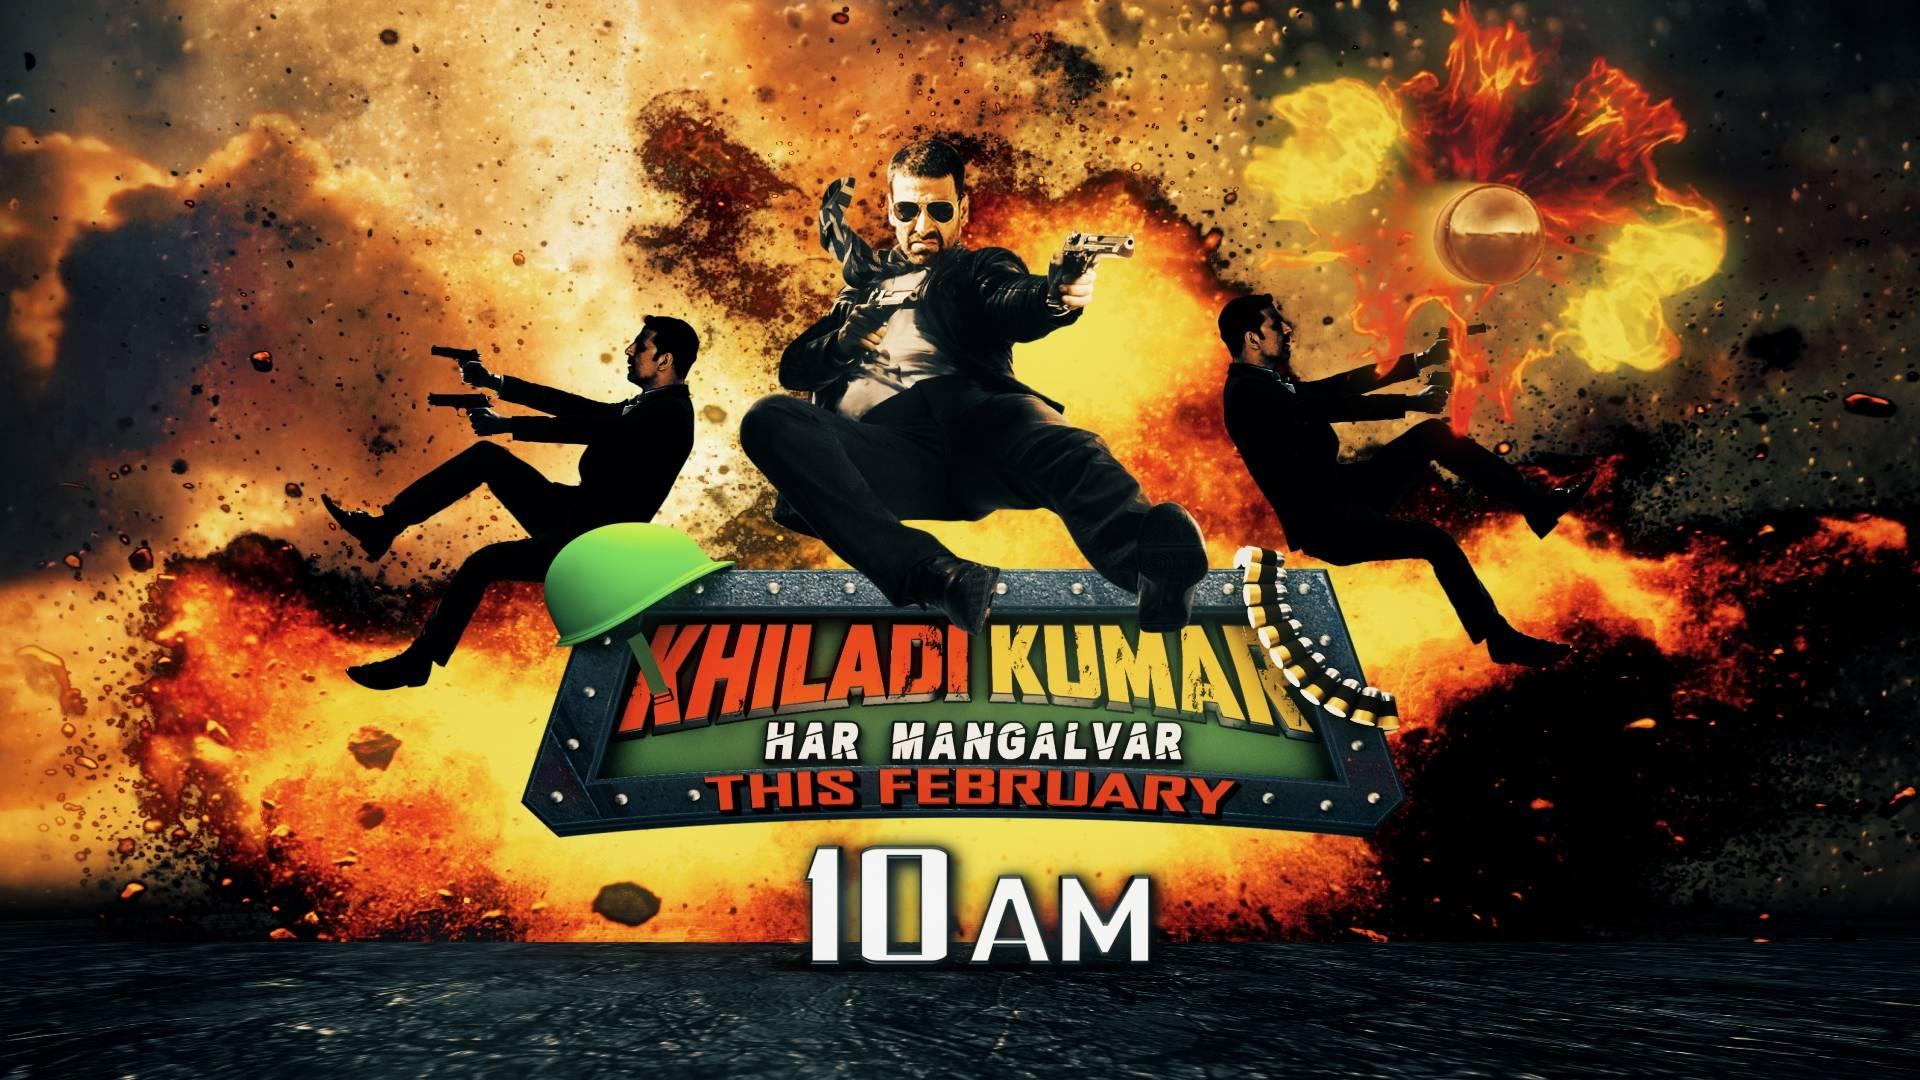 Catch Akshay Kumar every Tuesday at 10AM only on RishteyCineplex.